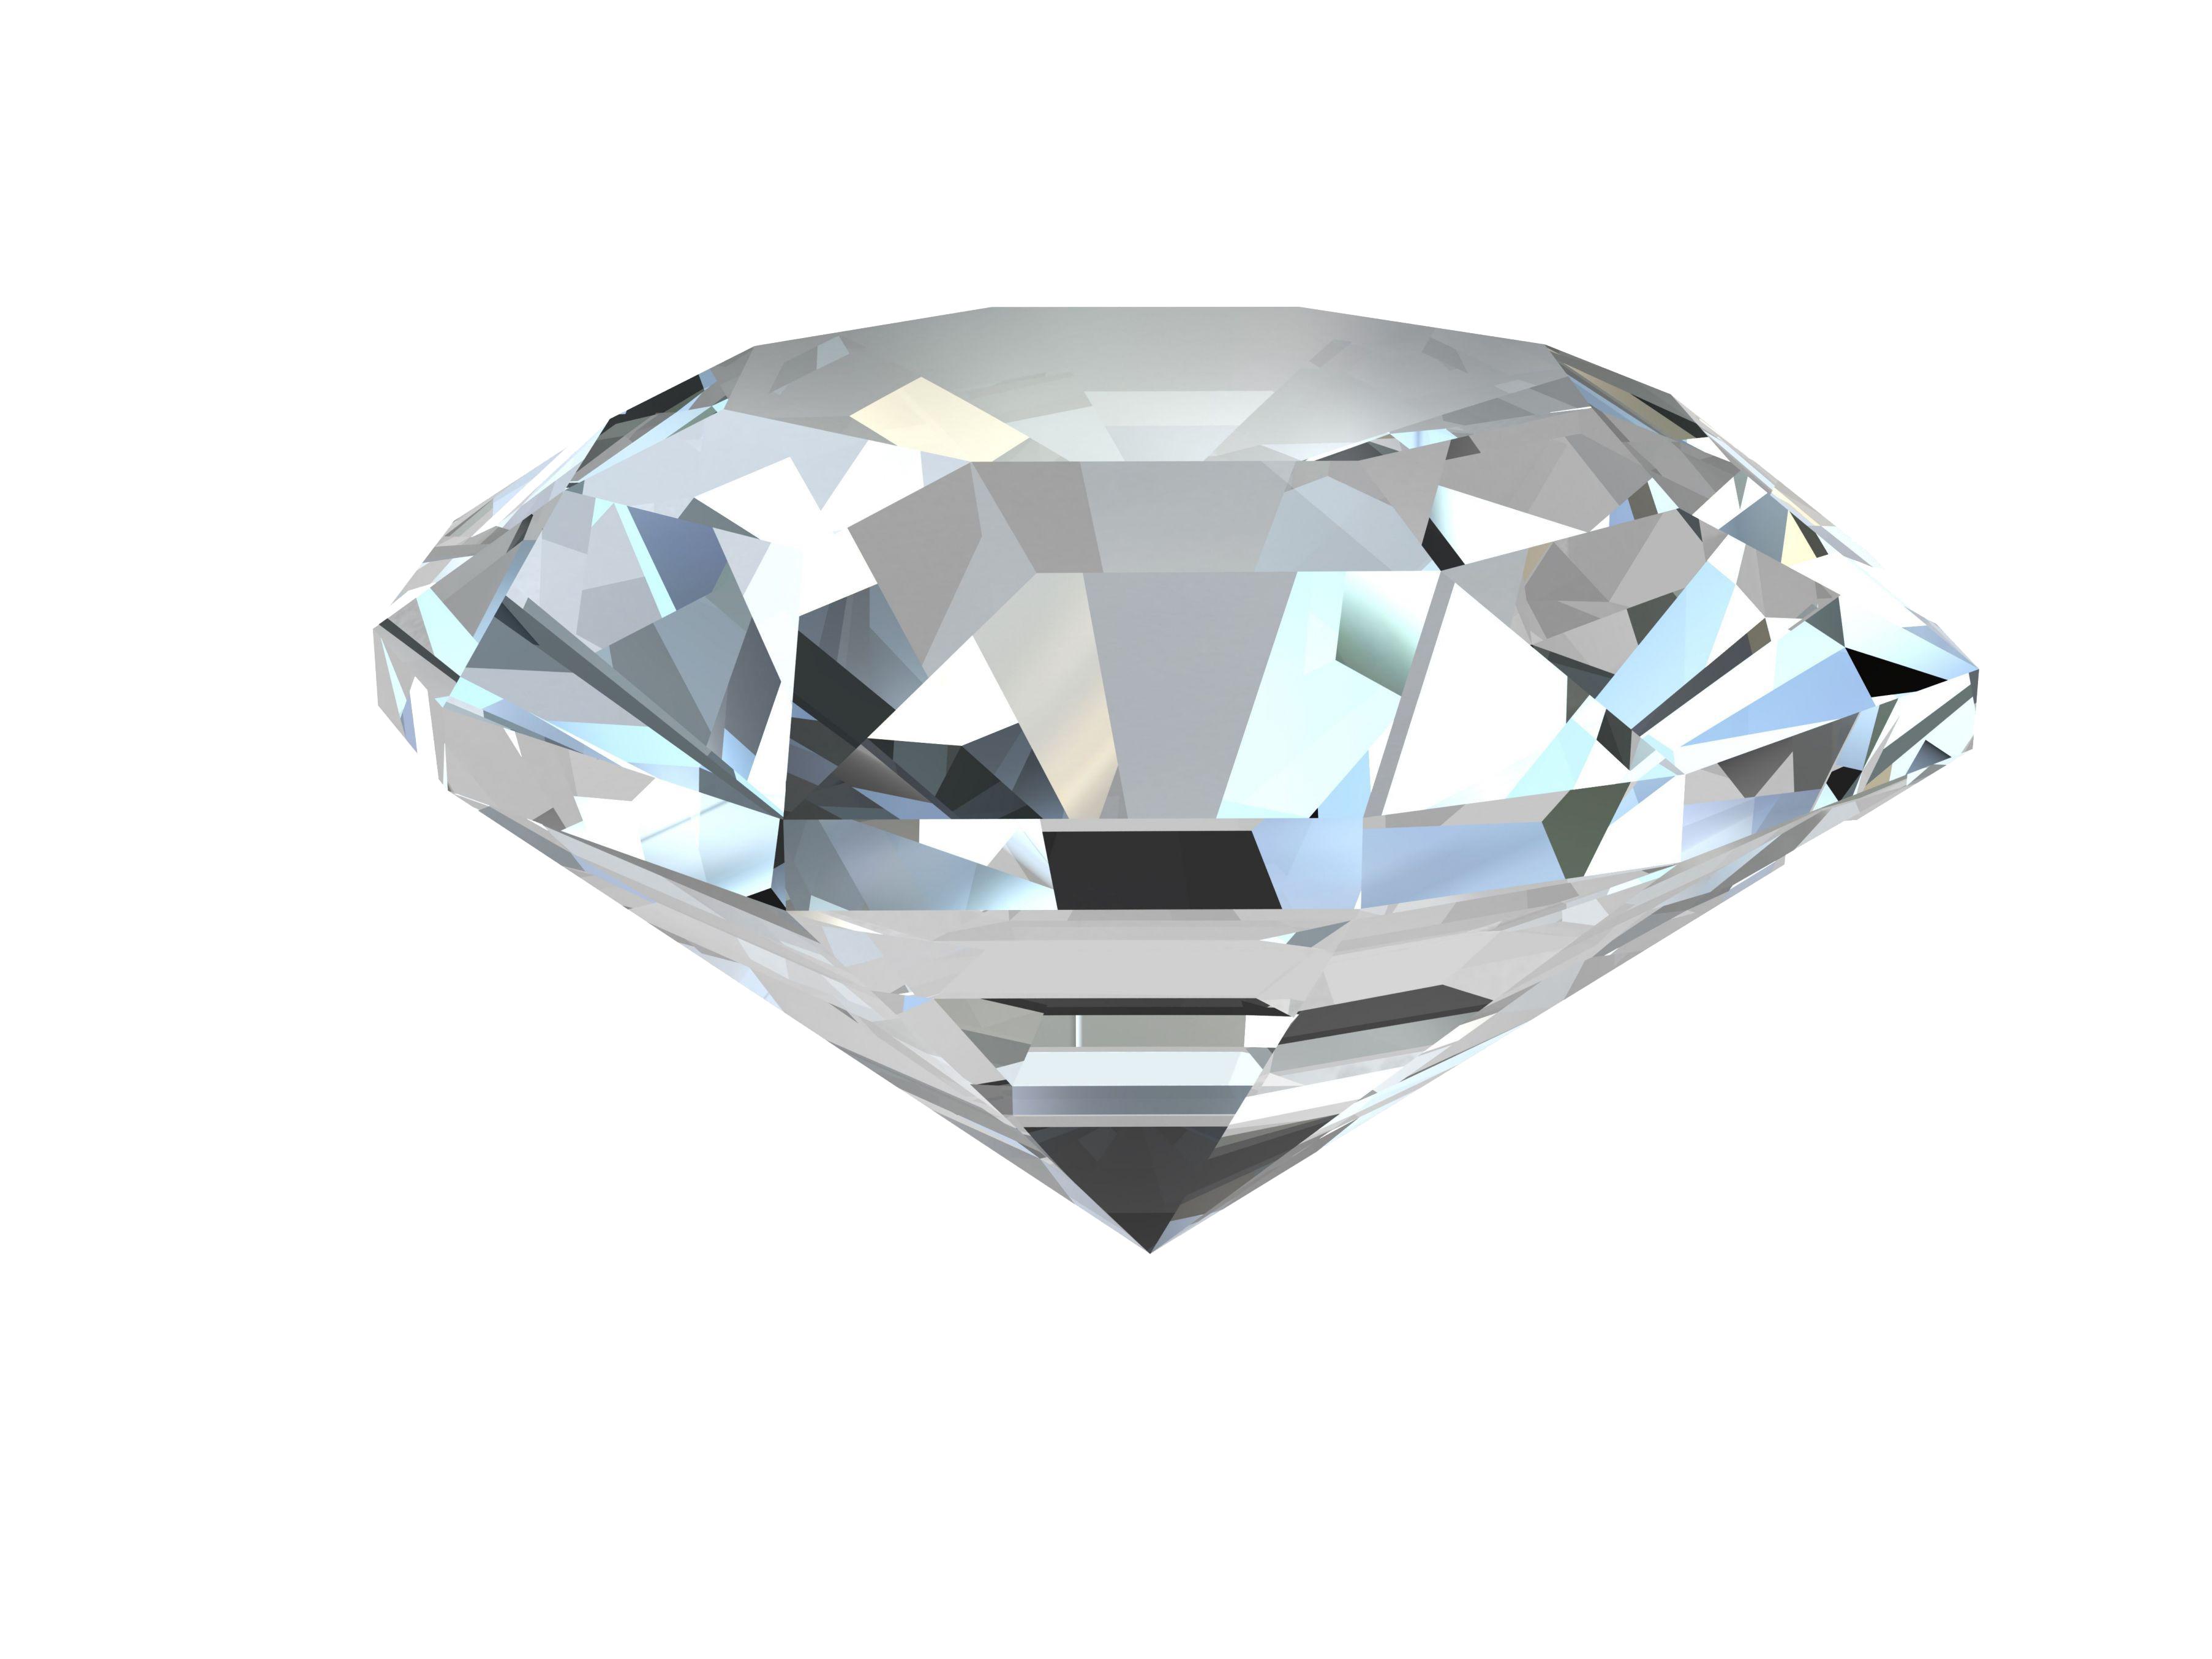 Diamond HD PNG - 120195